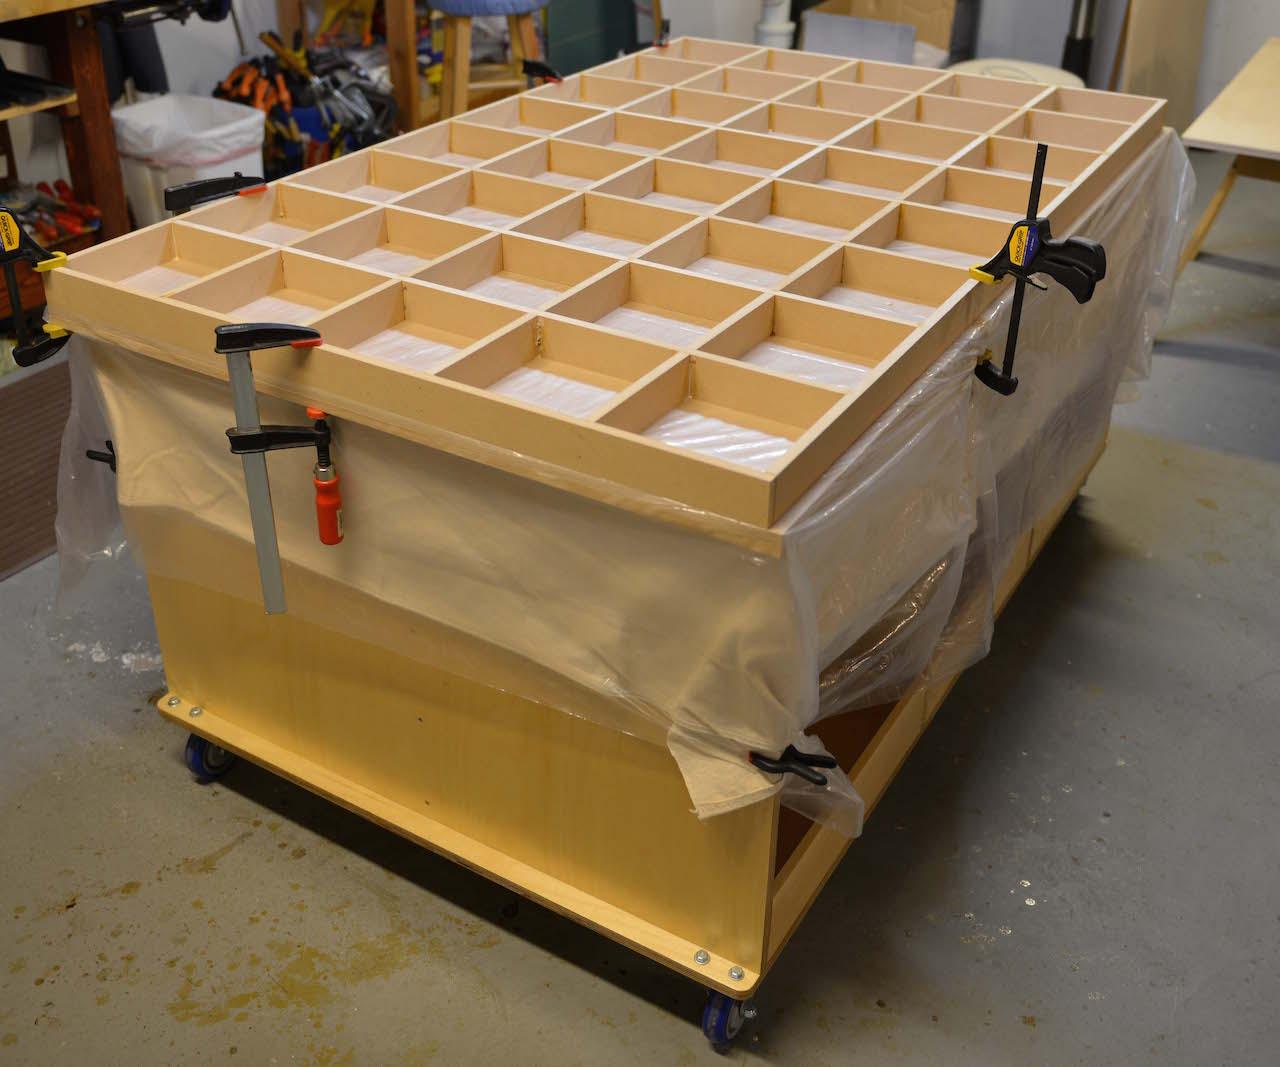 Ken S Mobile Torsion Box Assembly Table The Wood Whisperer